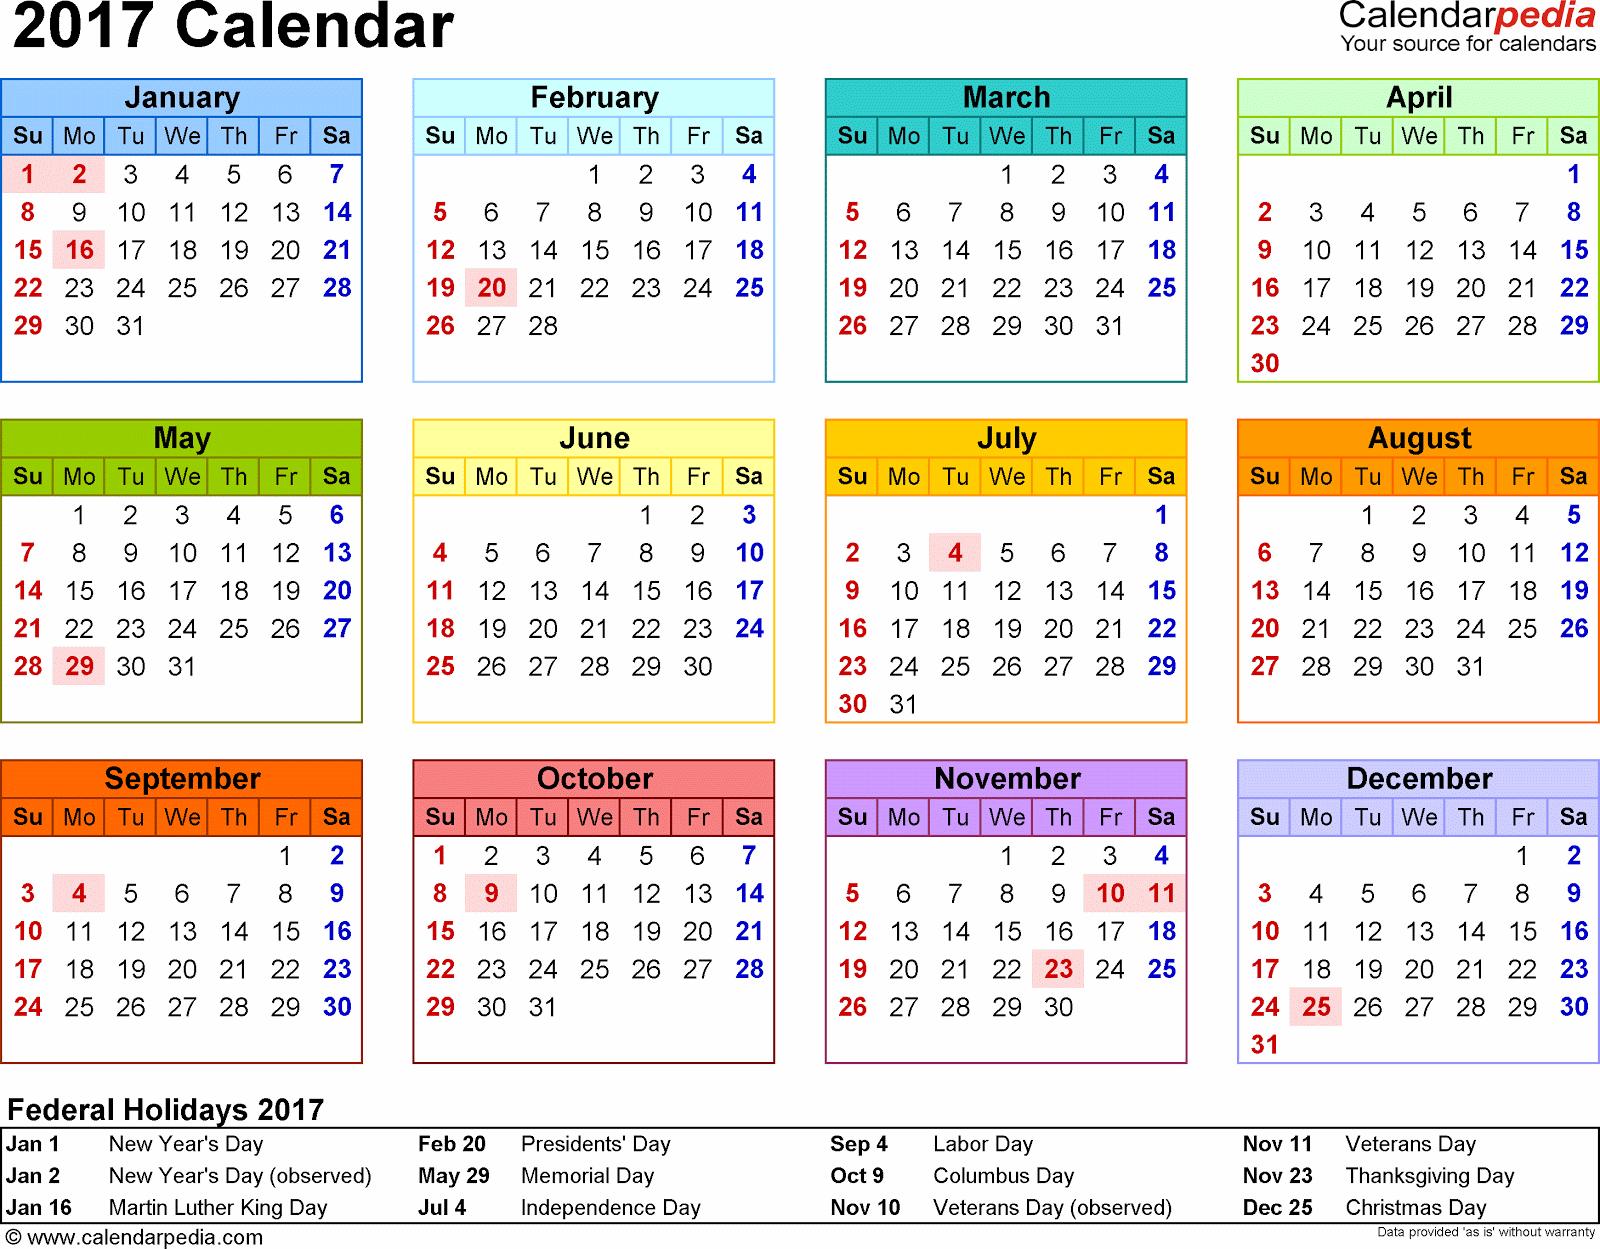 Calendar clipart calendar month Printable Calendar 2017 April Printable